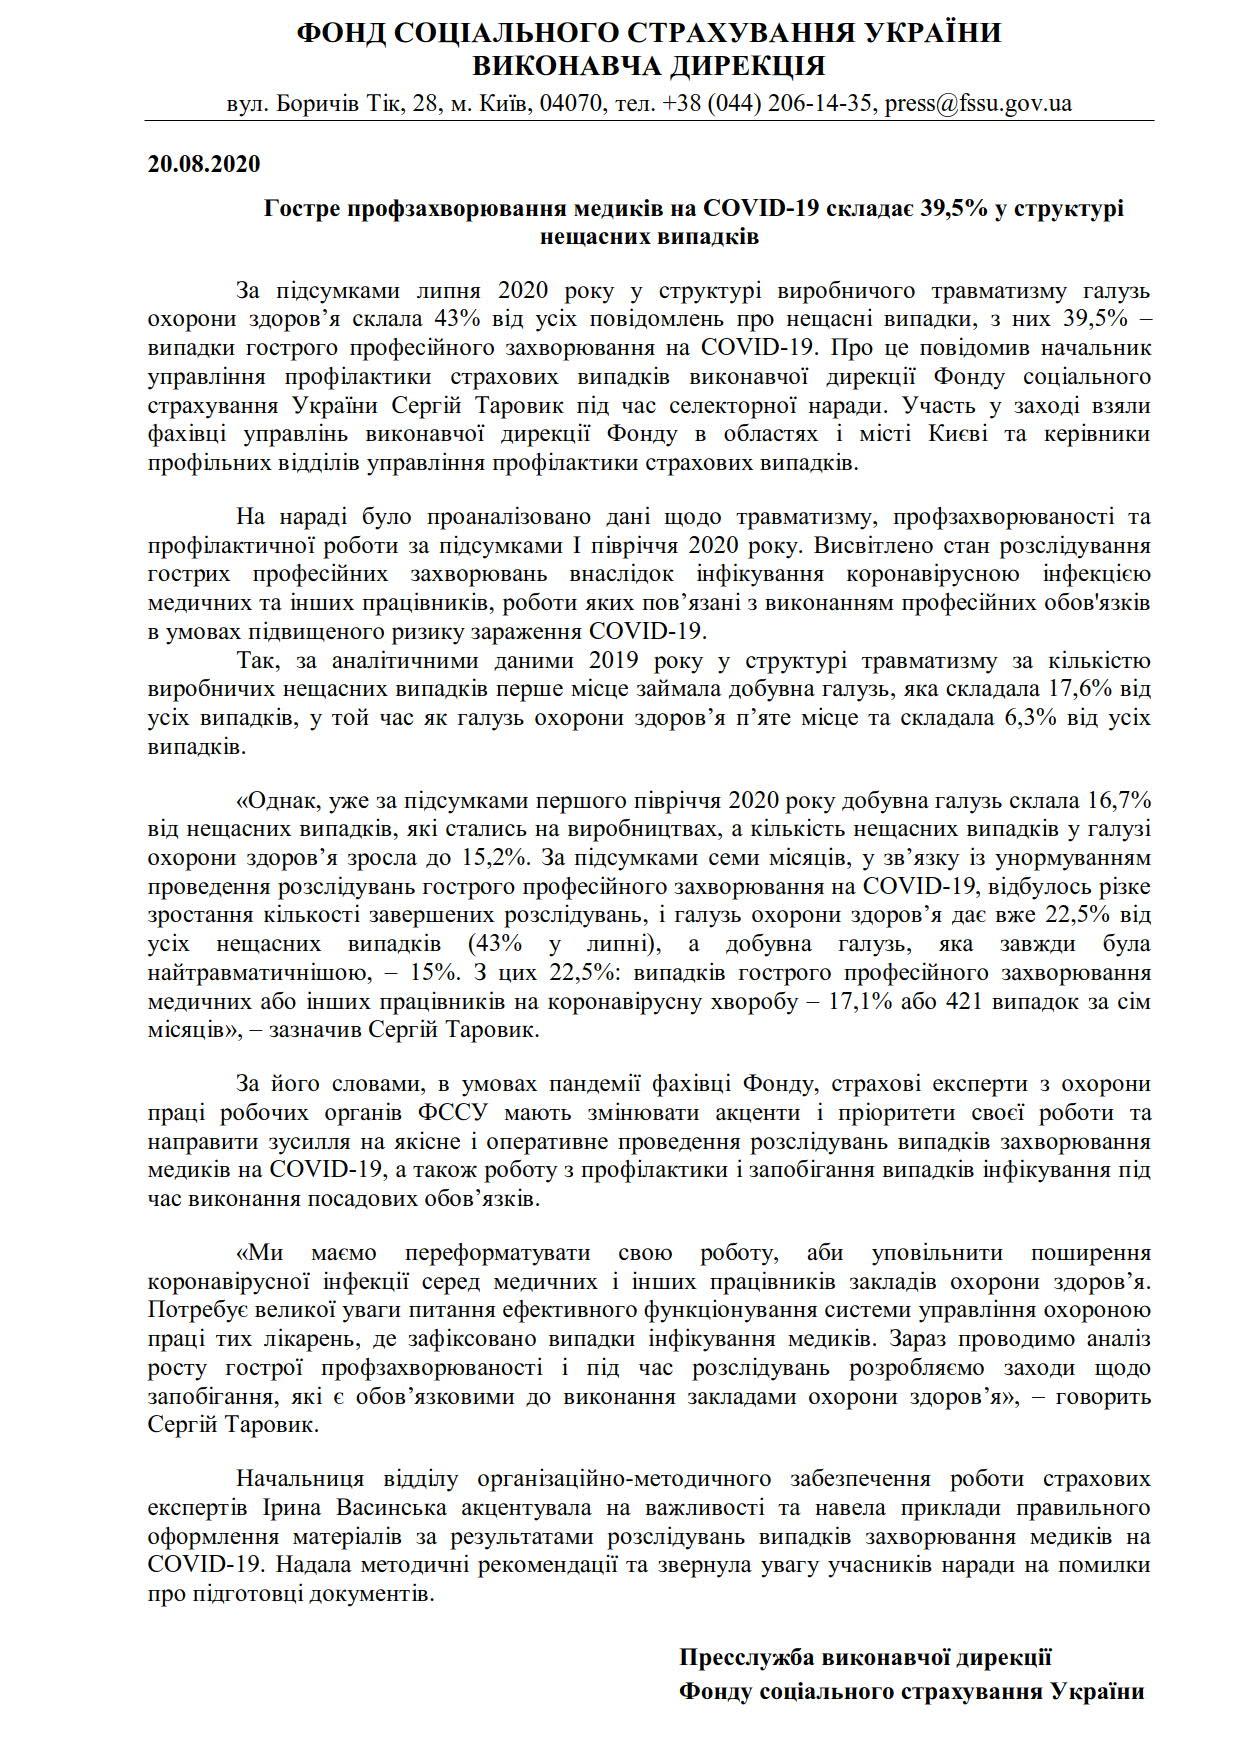 ФССУ_Селектор Таровик серпень_1